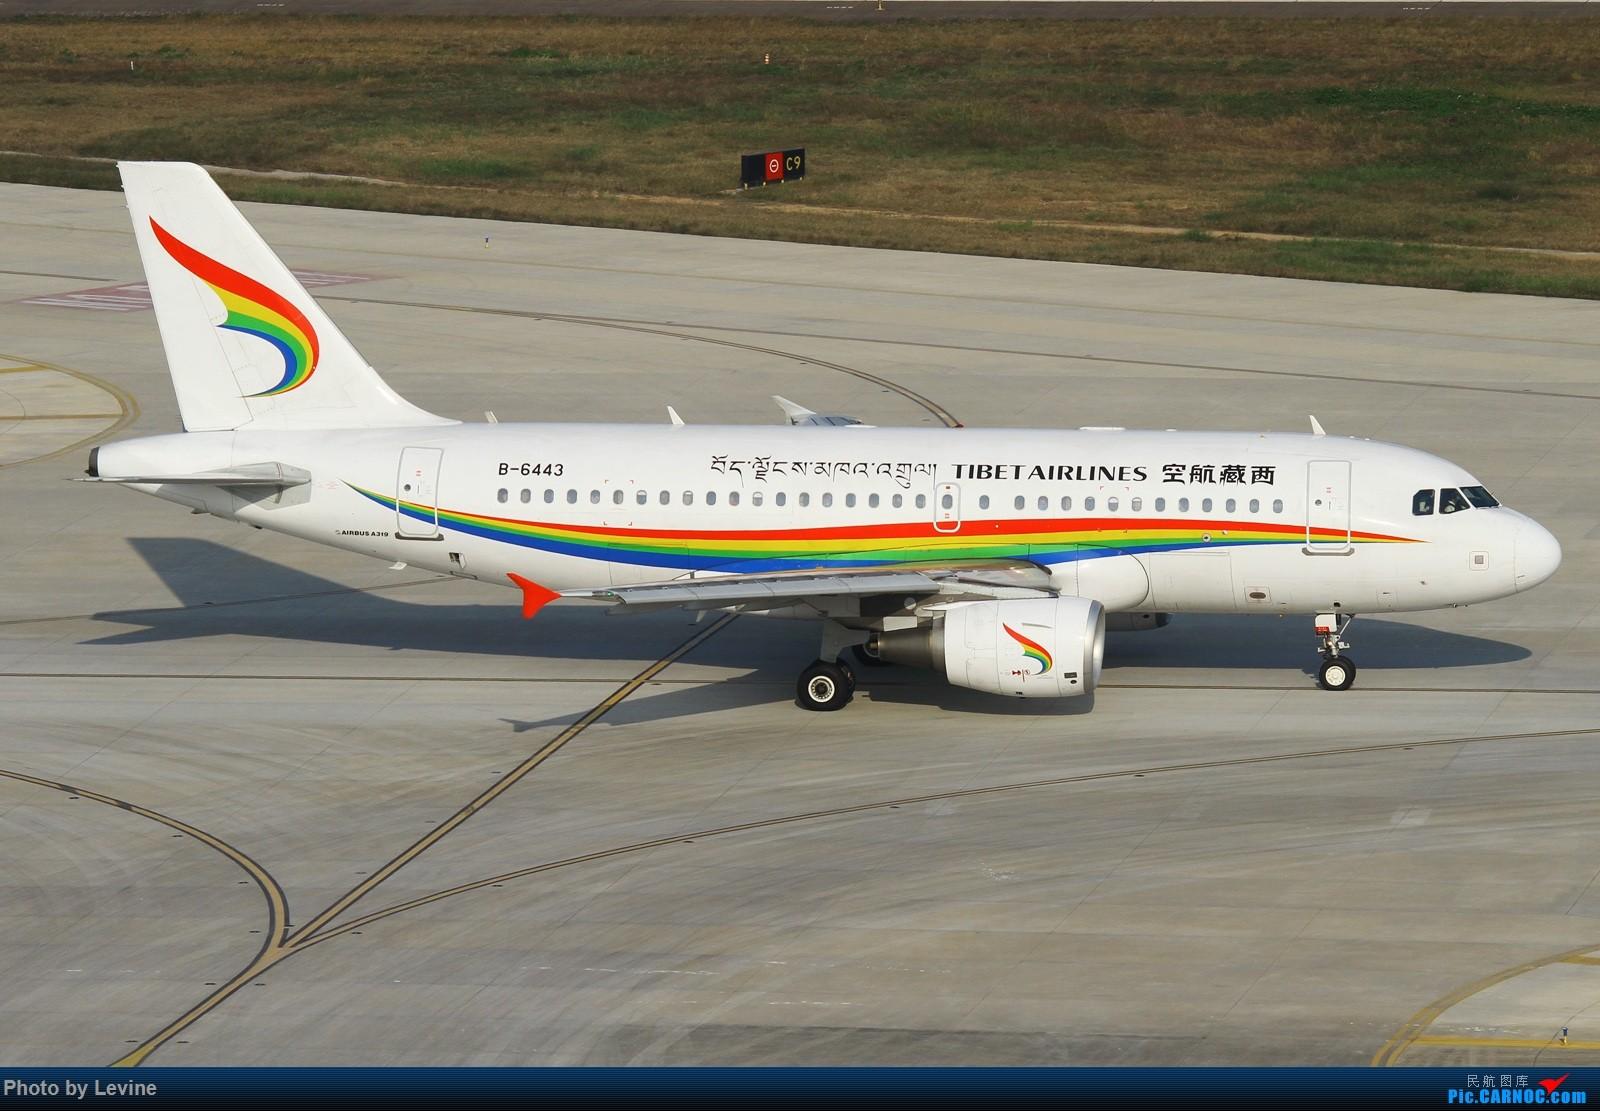 Re:[原创]2015第一拍 冬日暖阳 怎么都拍不腻 AIRBUS A319-100 B-6443 中国深圳宝安国际机场